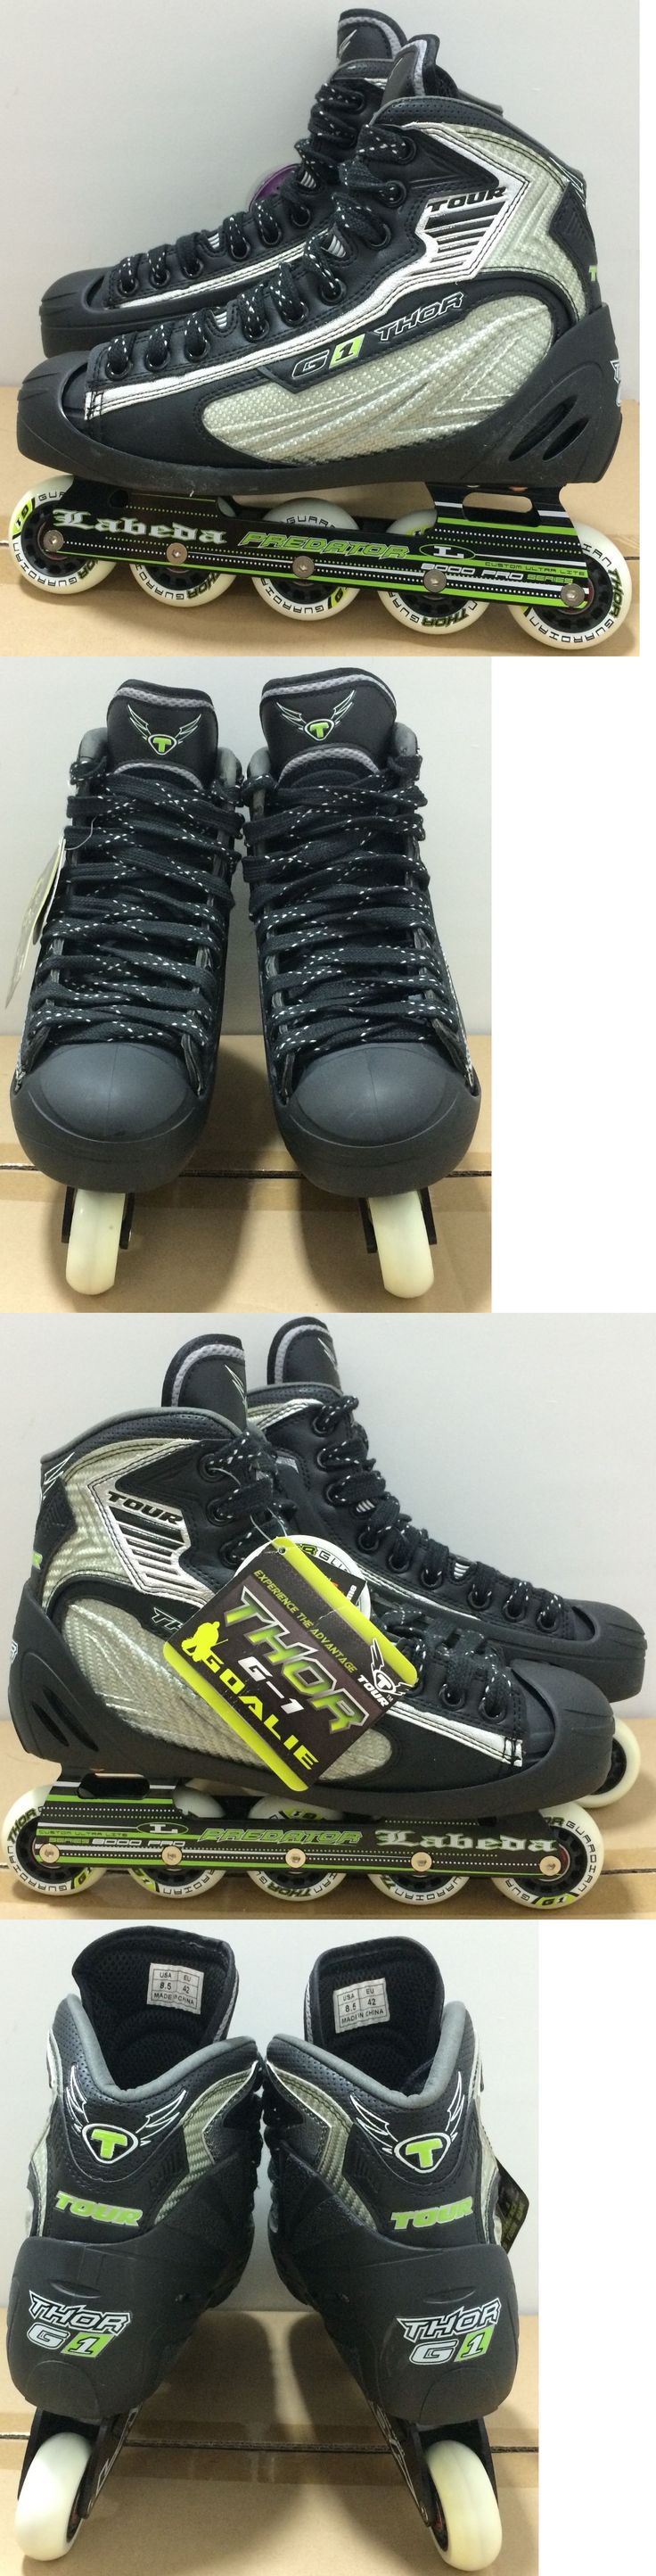 Ice Hockey-Adult 20858: Tour Hockey Thor G-1 Senior Roller Hockey Goalie Skates All Sizes 6001 - His -> BUY IT NOW ONLY: $170 on eBay!